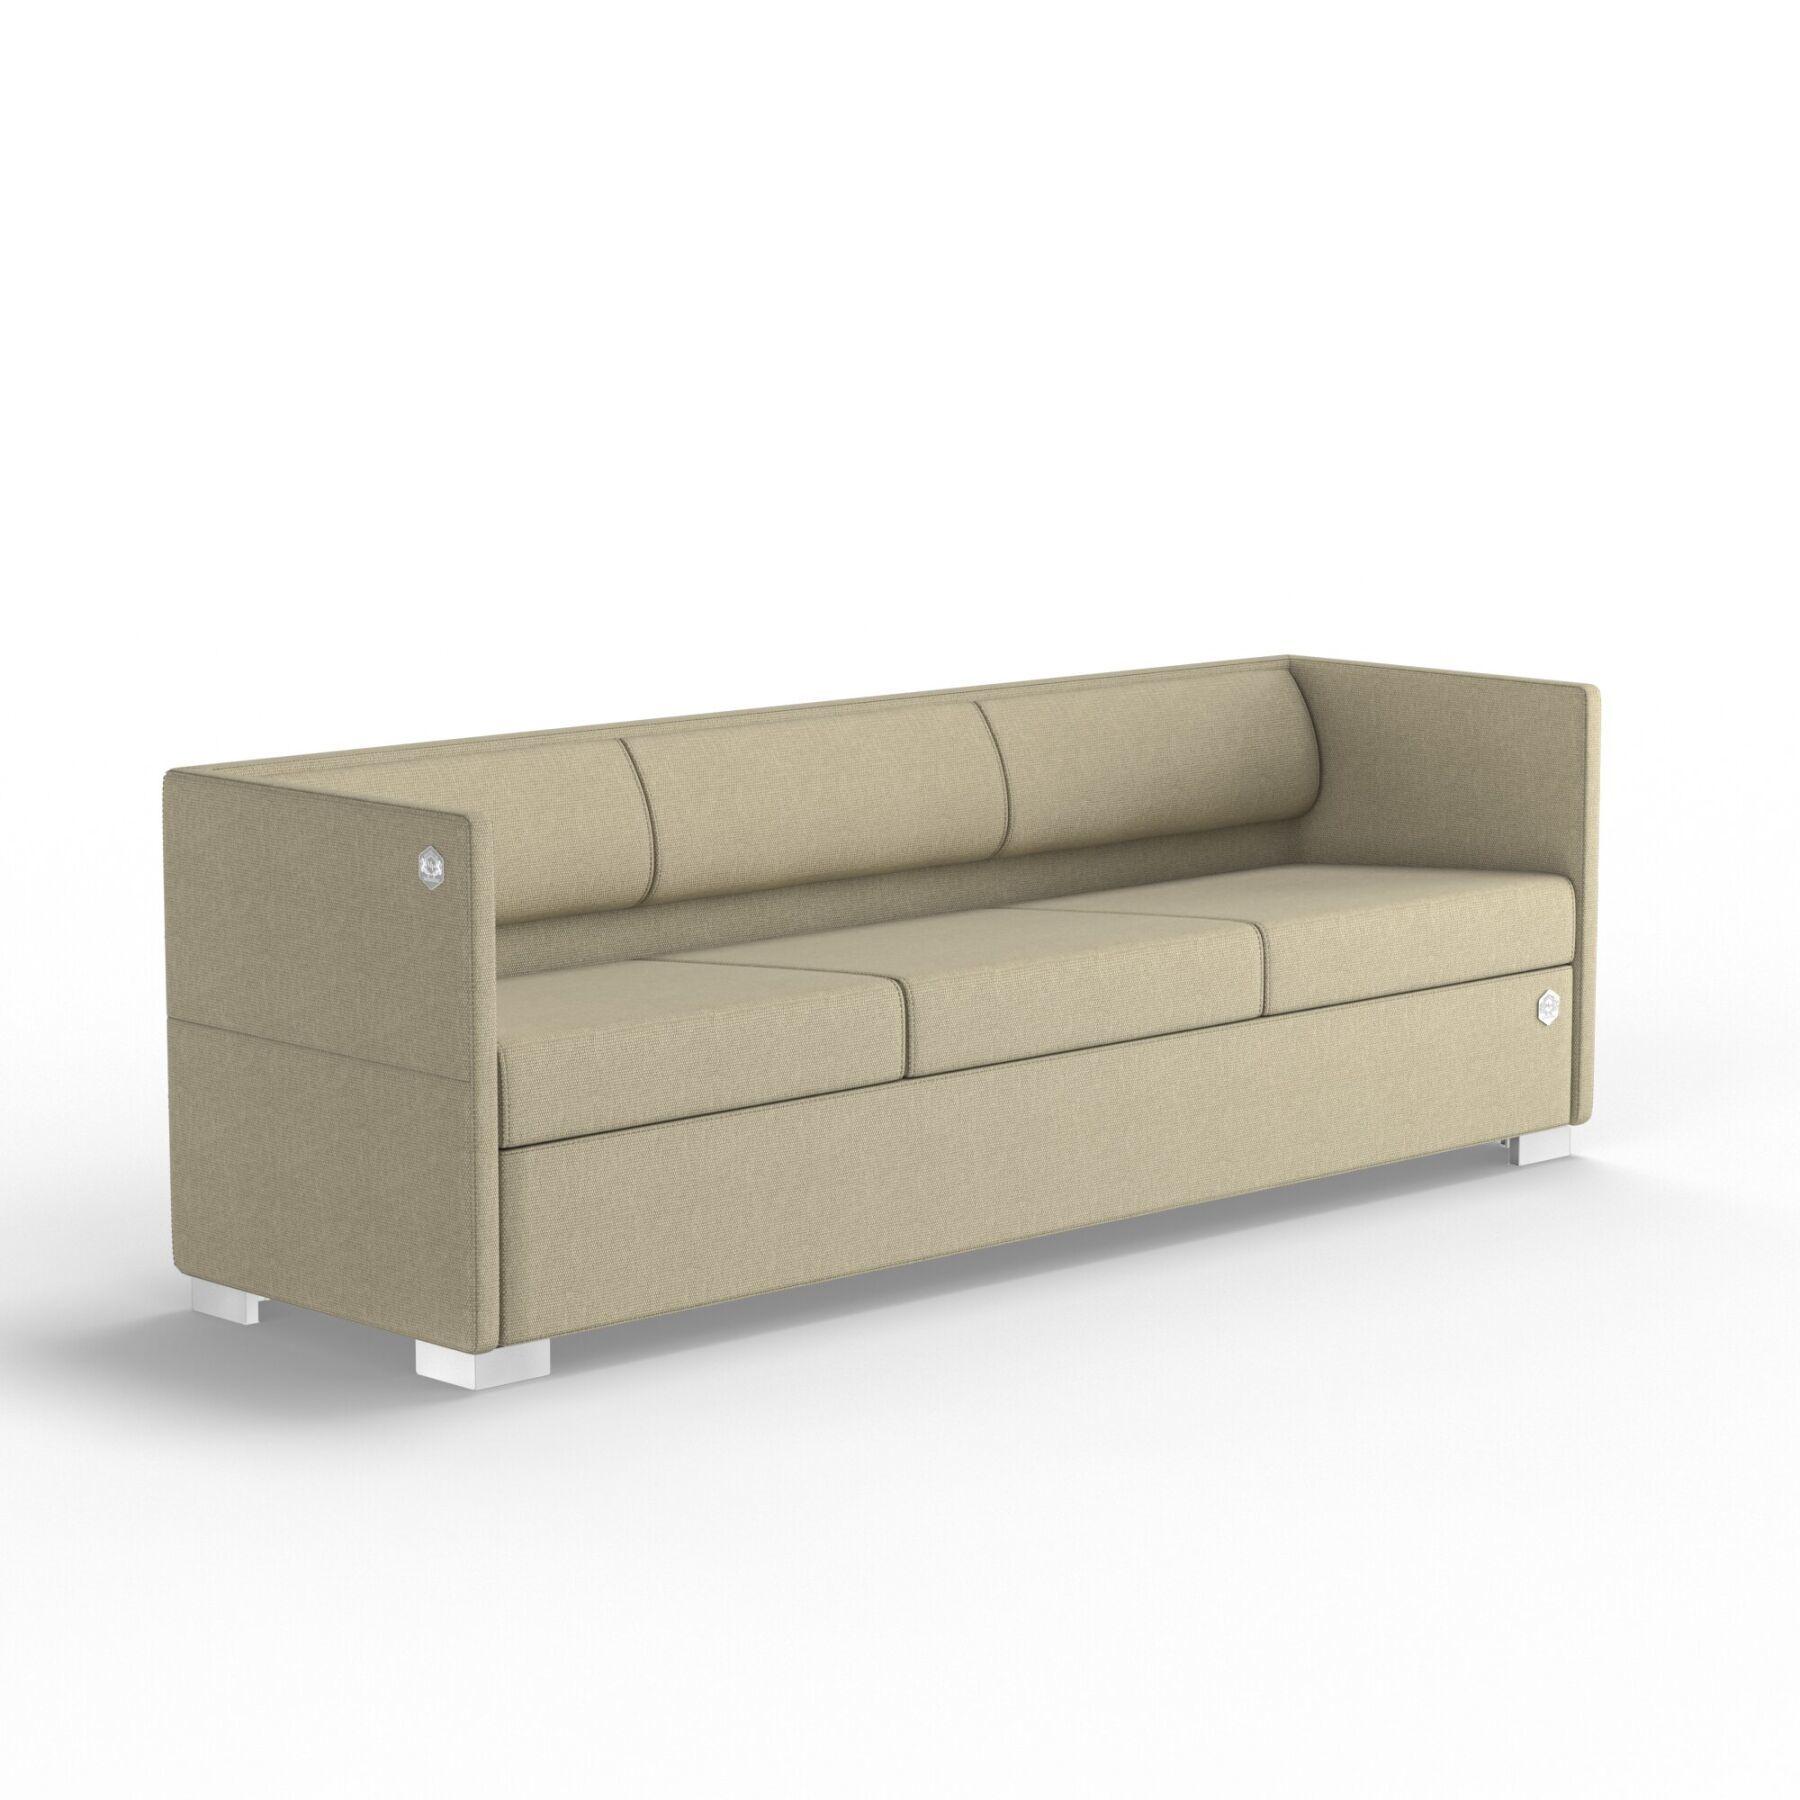 Трехместный диван KULIK SYSTEM LOUNGE Ткань 3